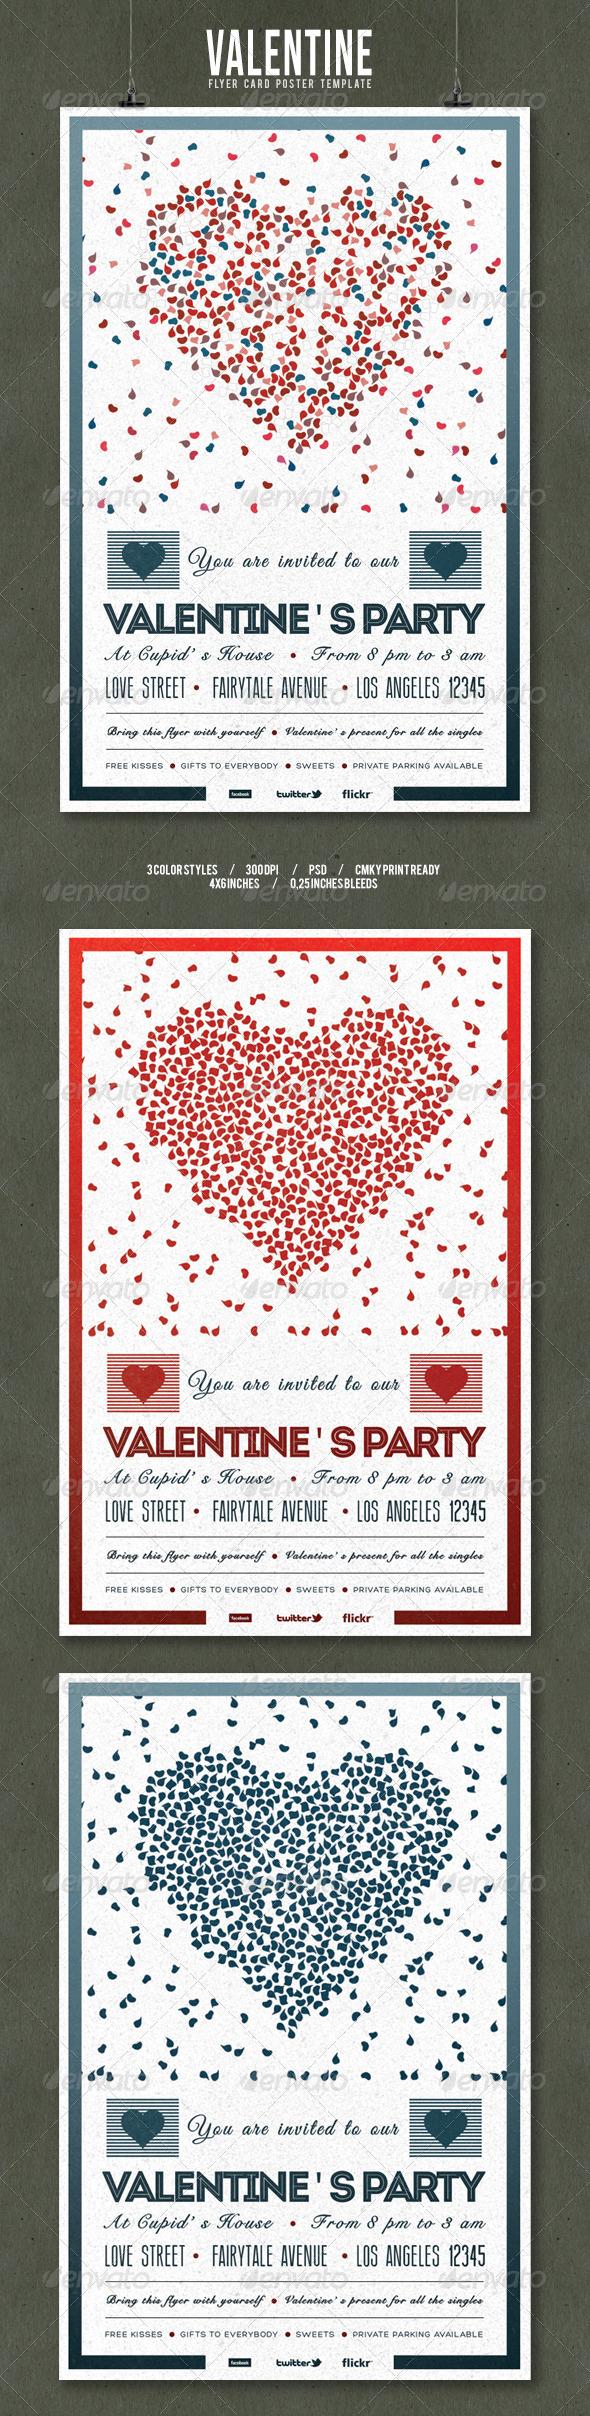 GraphicRiver Valentine s Day Flyer Poster Vintage Vol.2 6679462